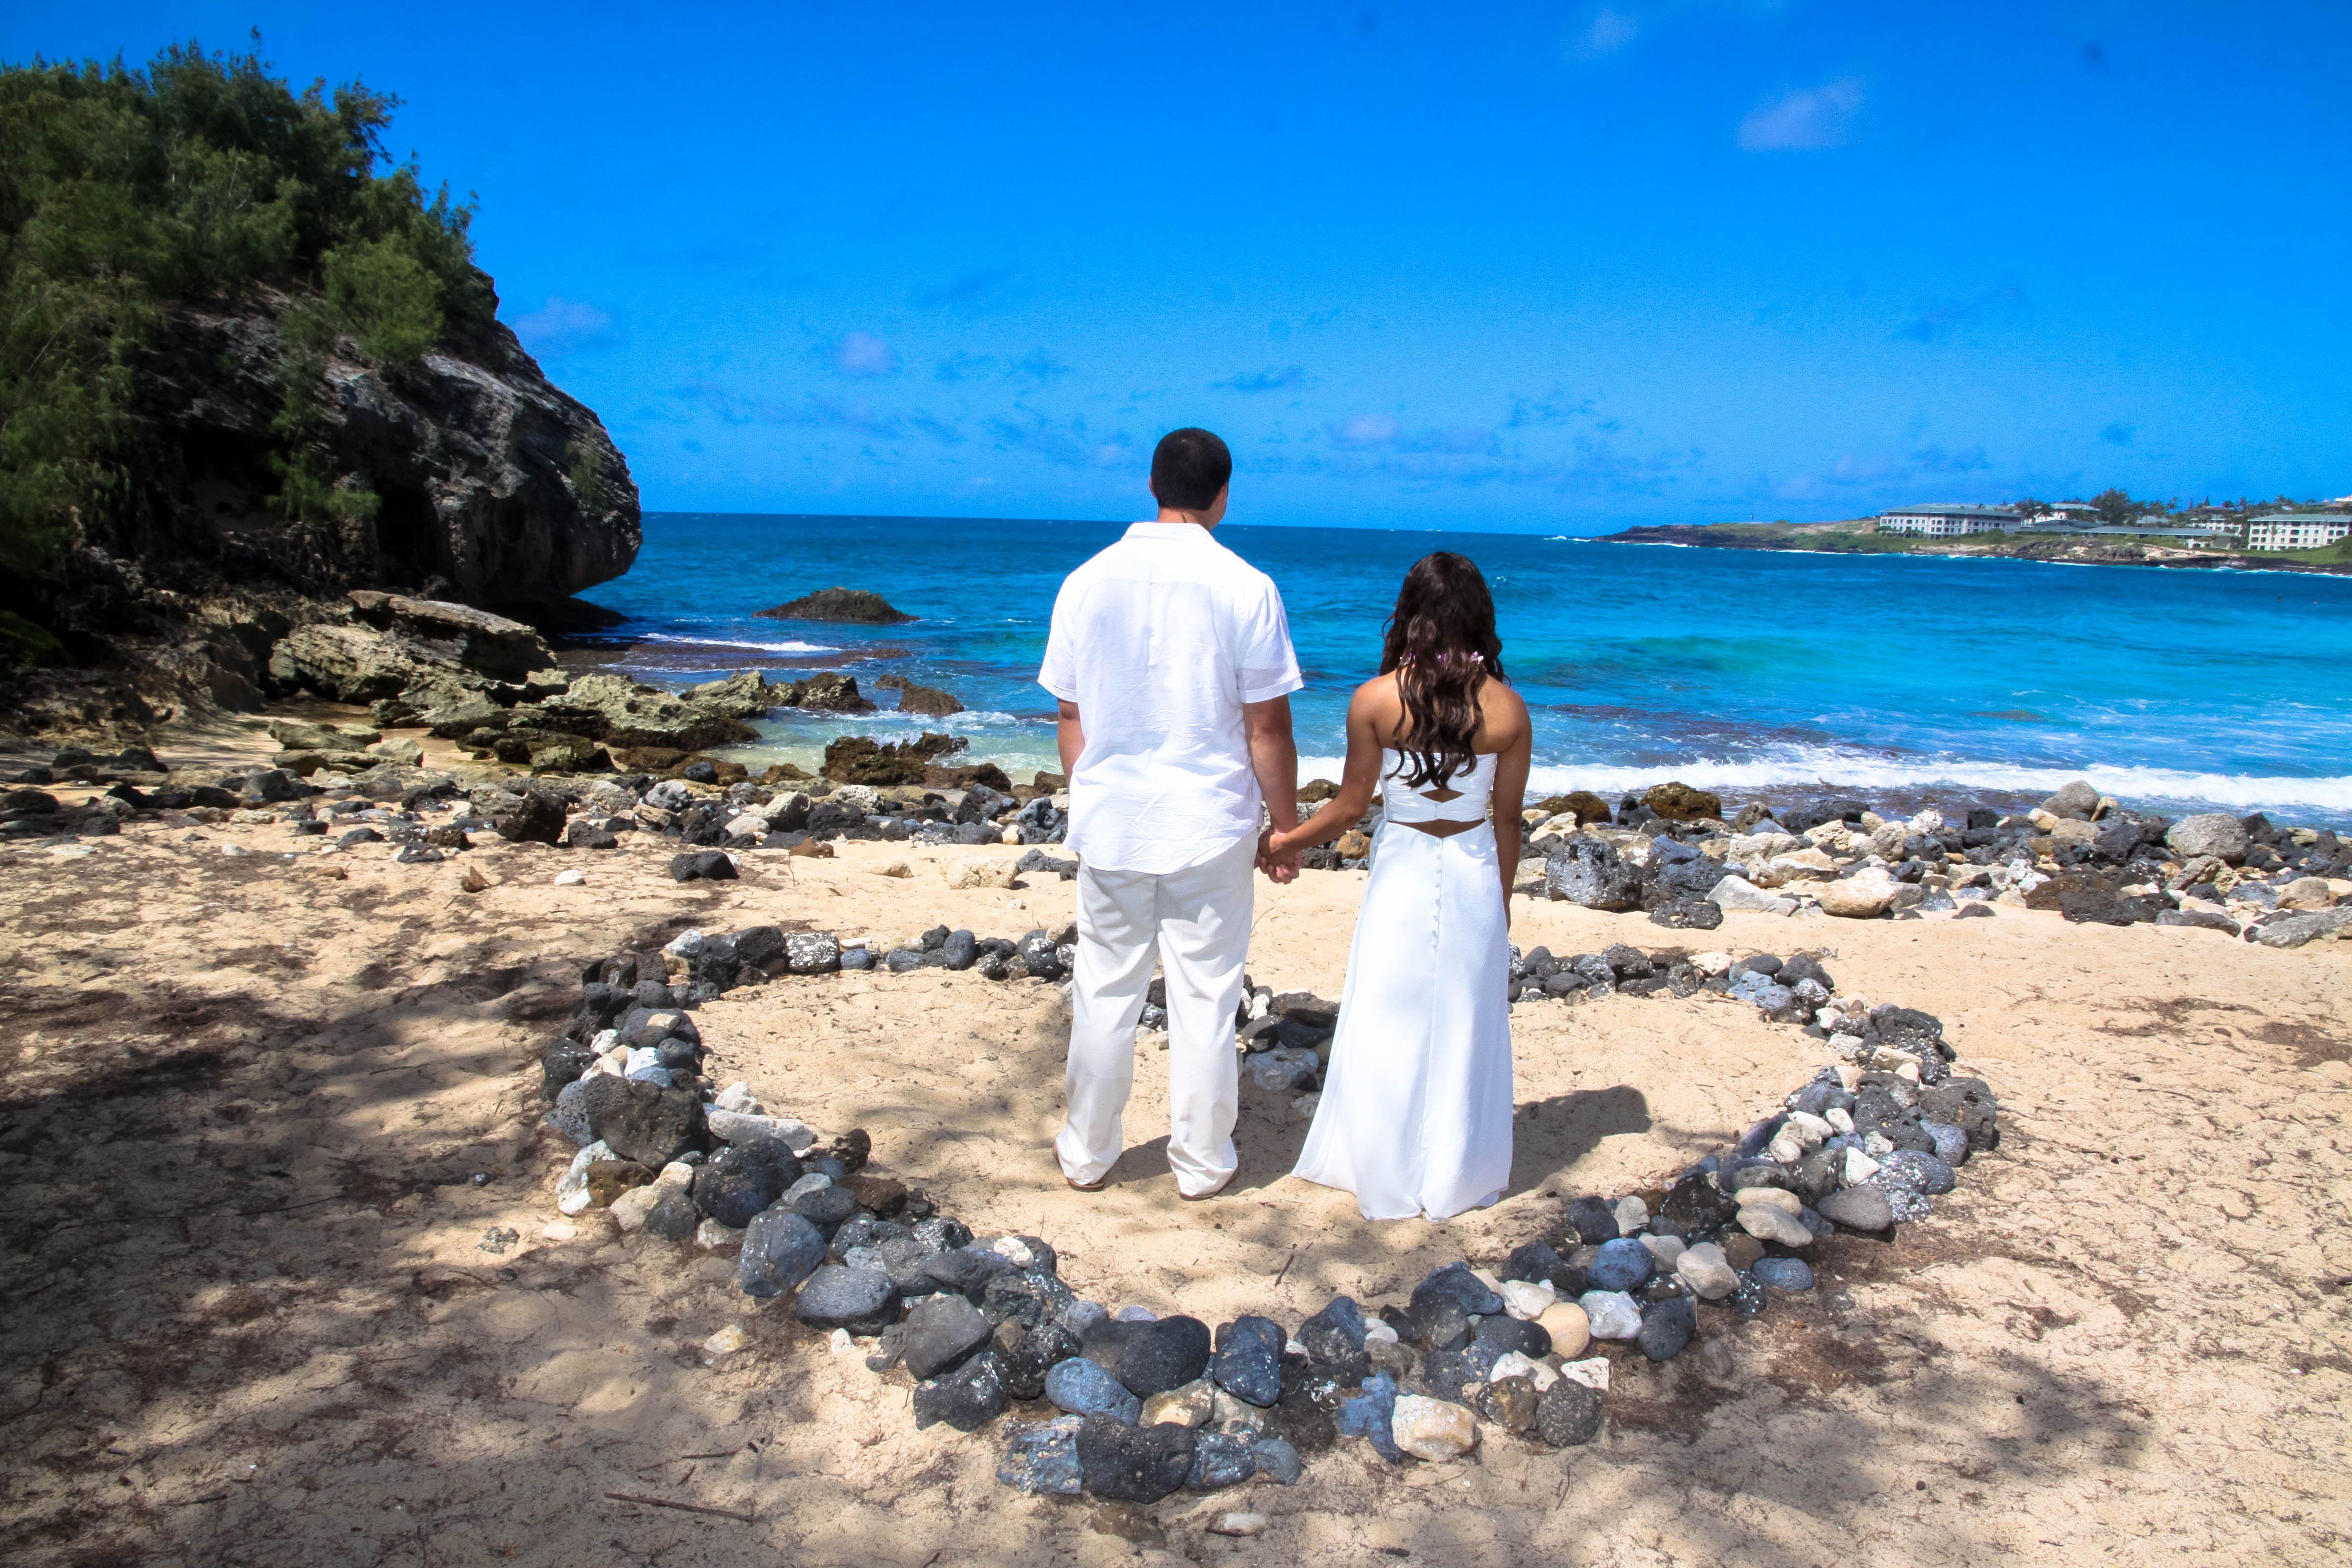 Shipwrecks Beach Kauai Wedding Planner Destination